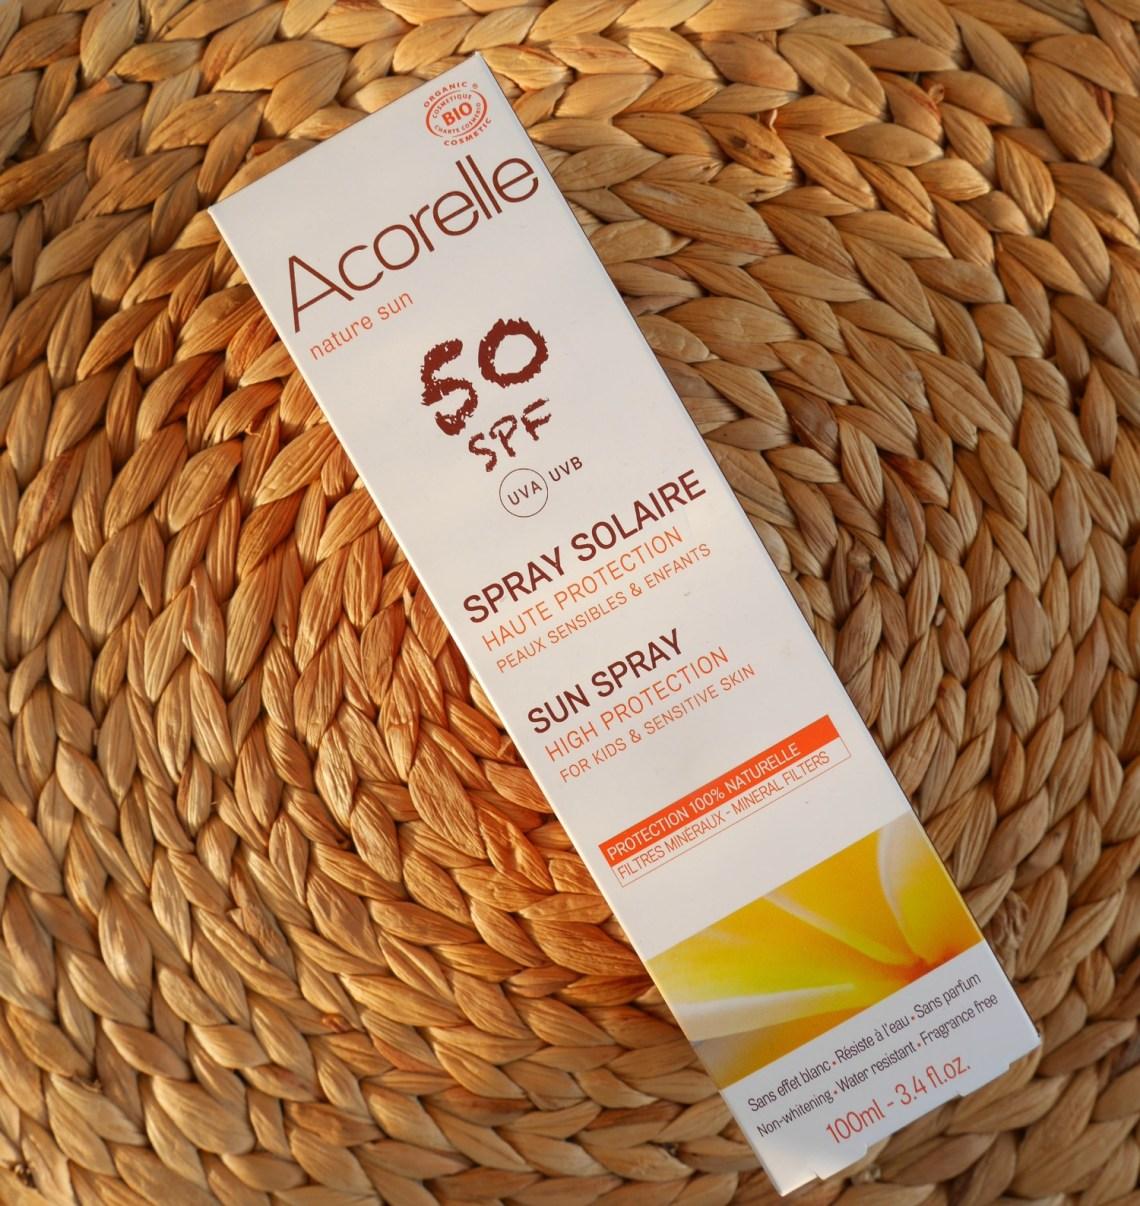 Acorelle sun spray